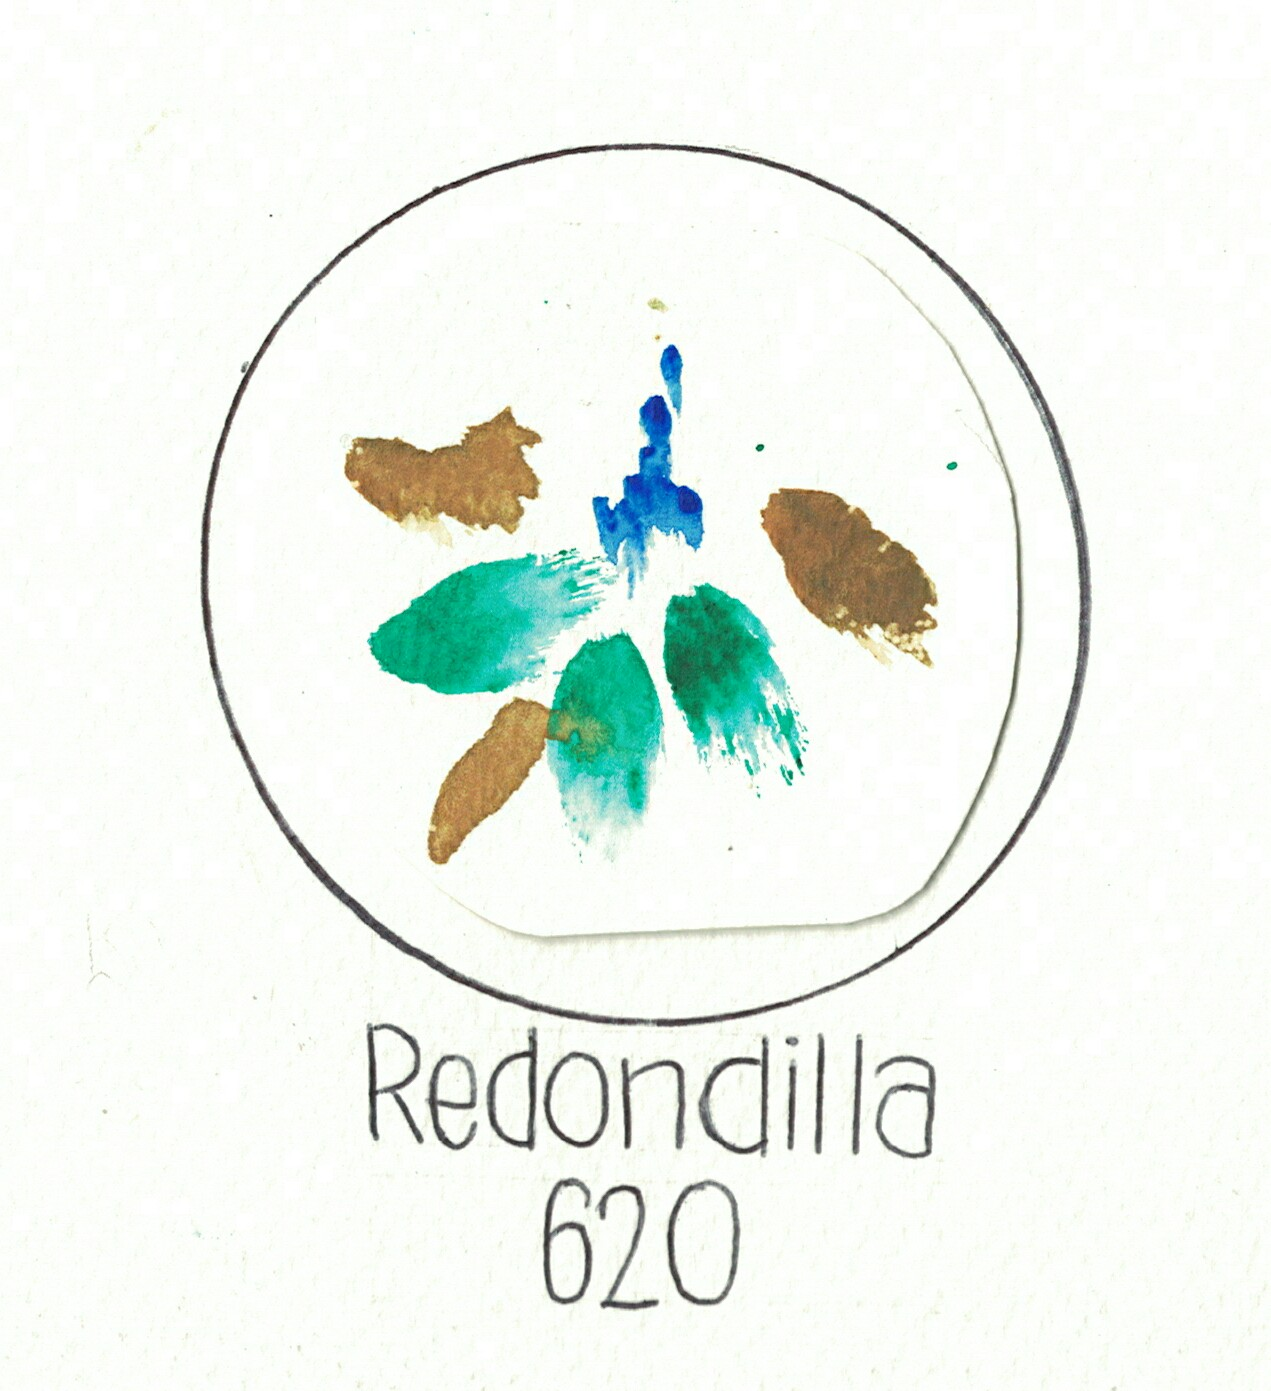 Redondilla620